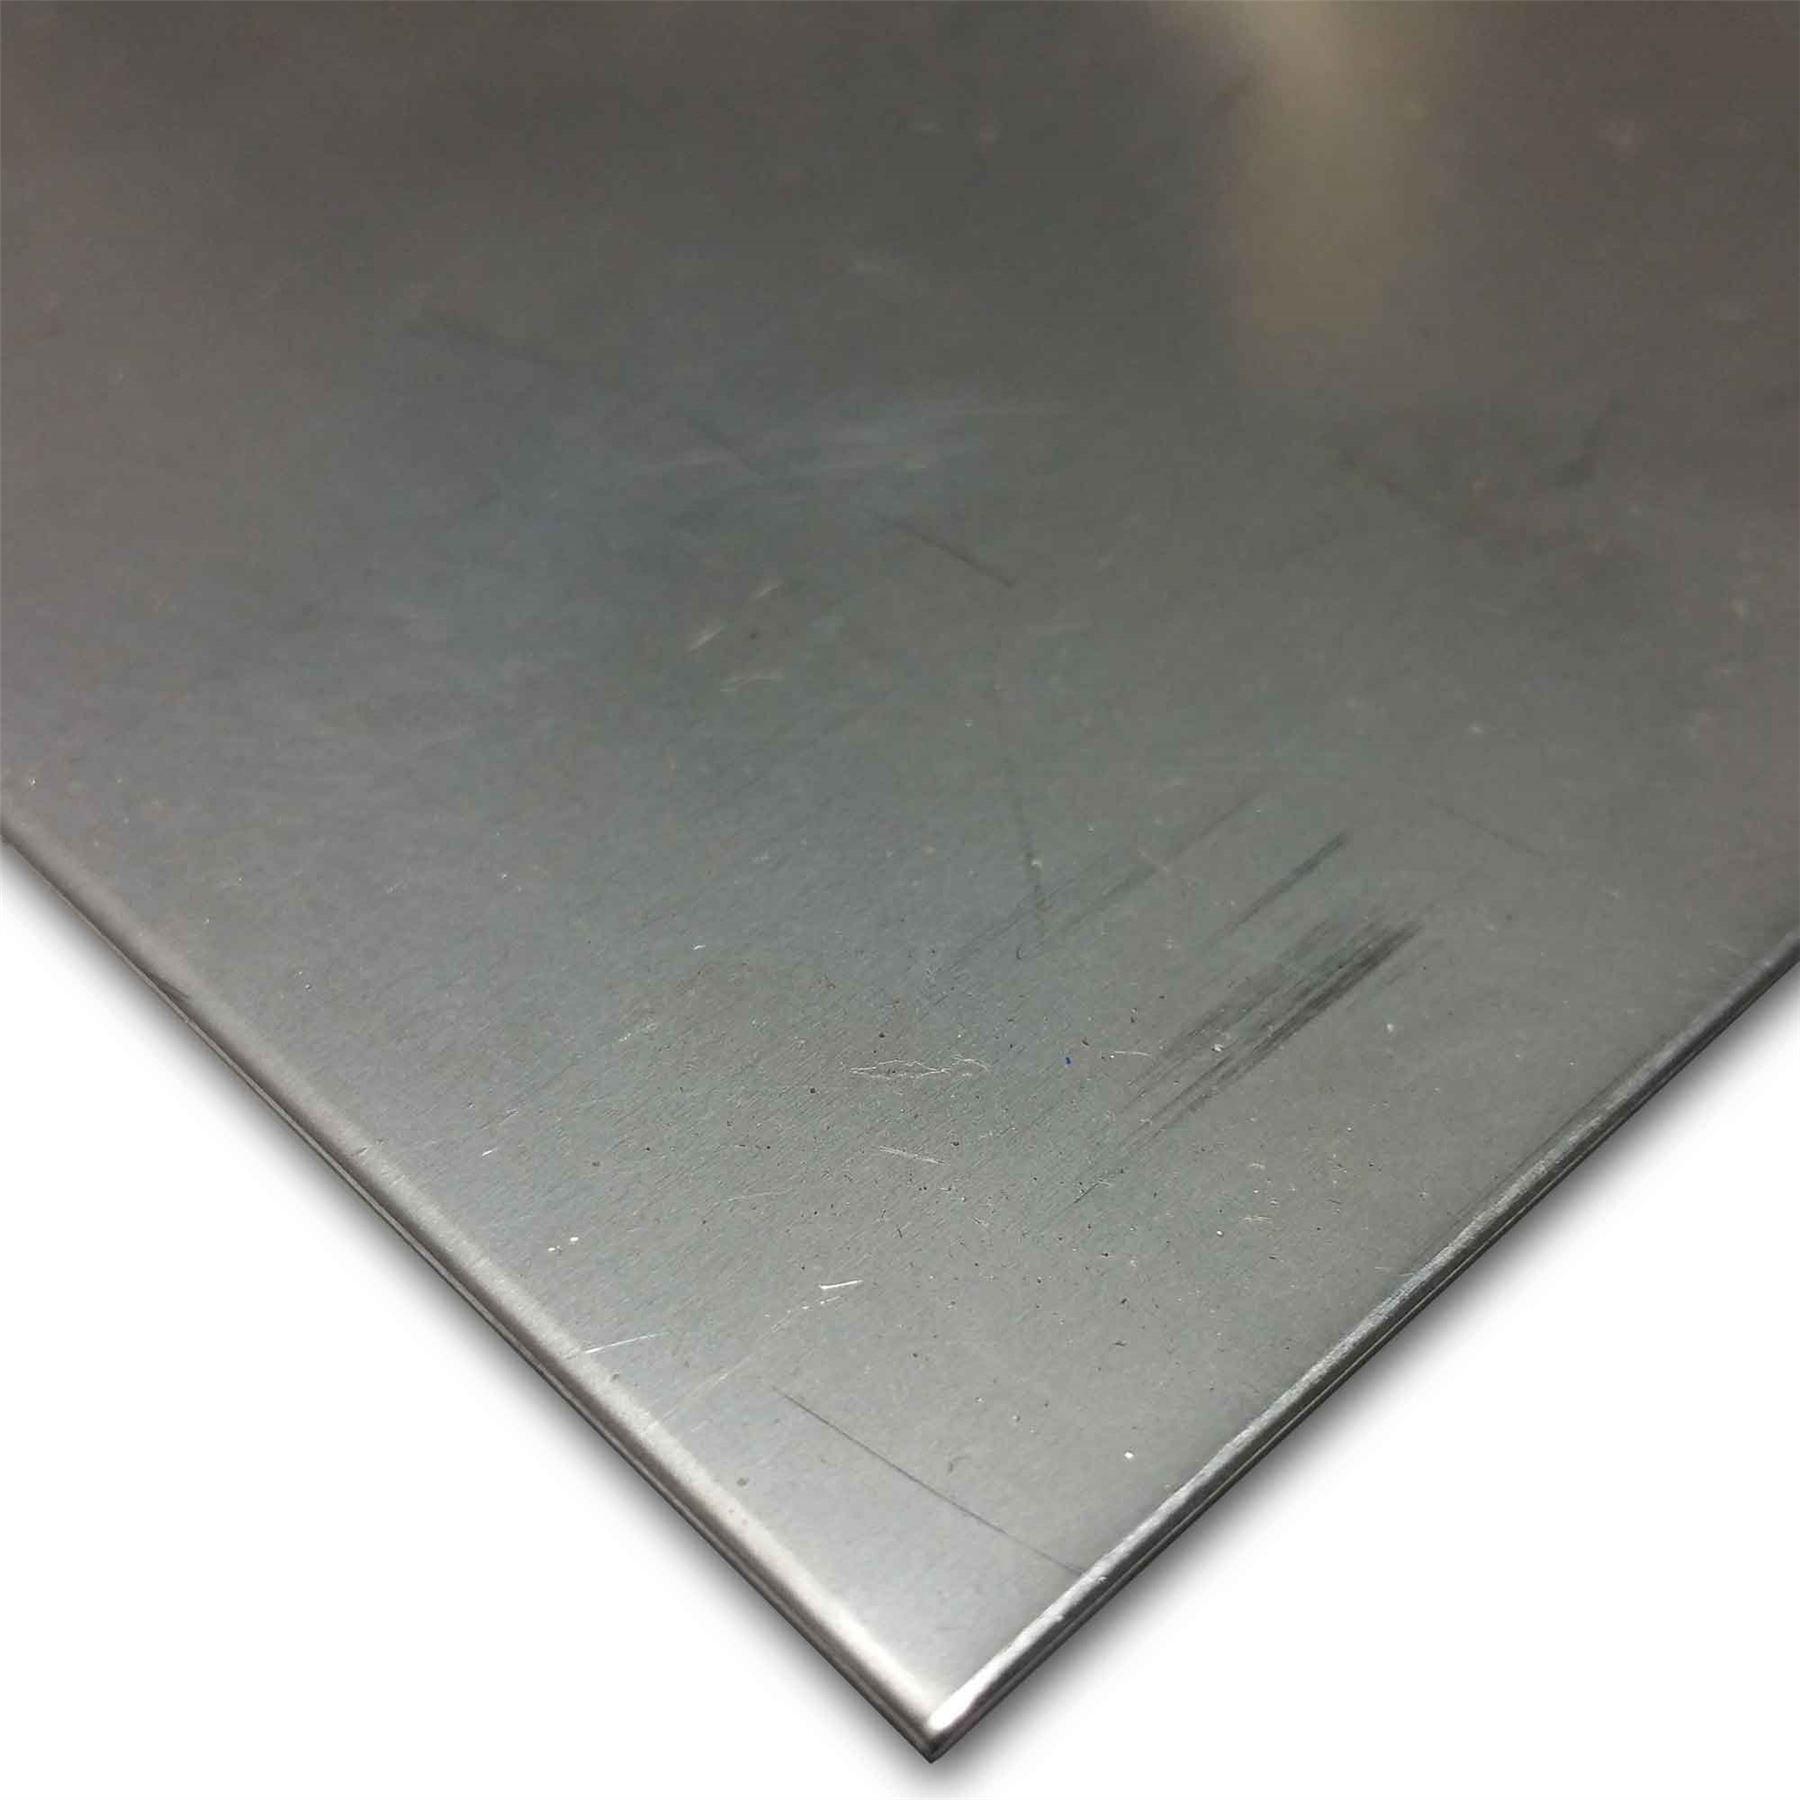 Stainless Steel Pipe Ø 70x2mm 1.4301 Length Selectable sanded k240 VA v2a Profile